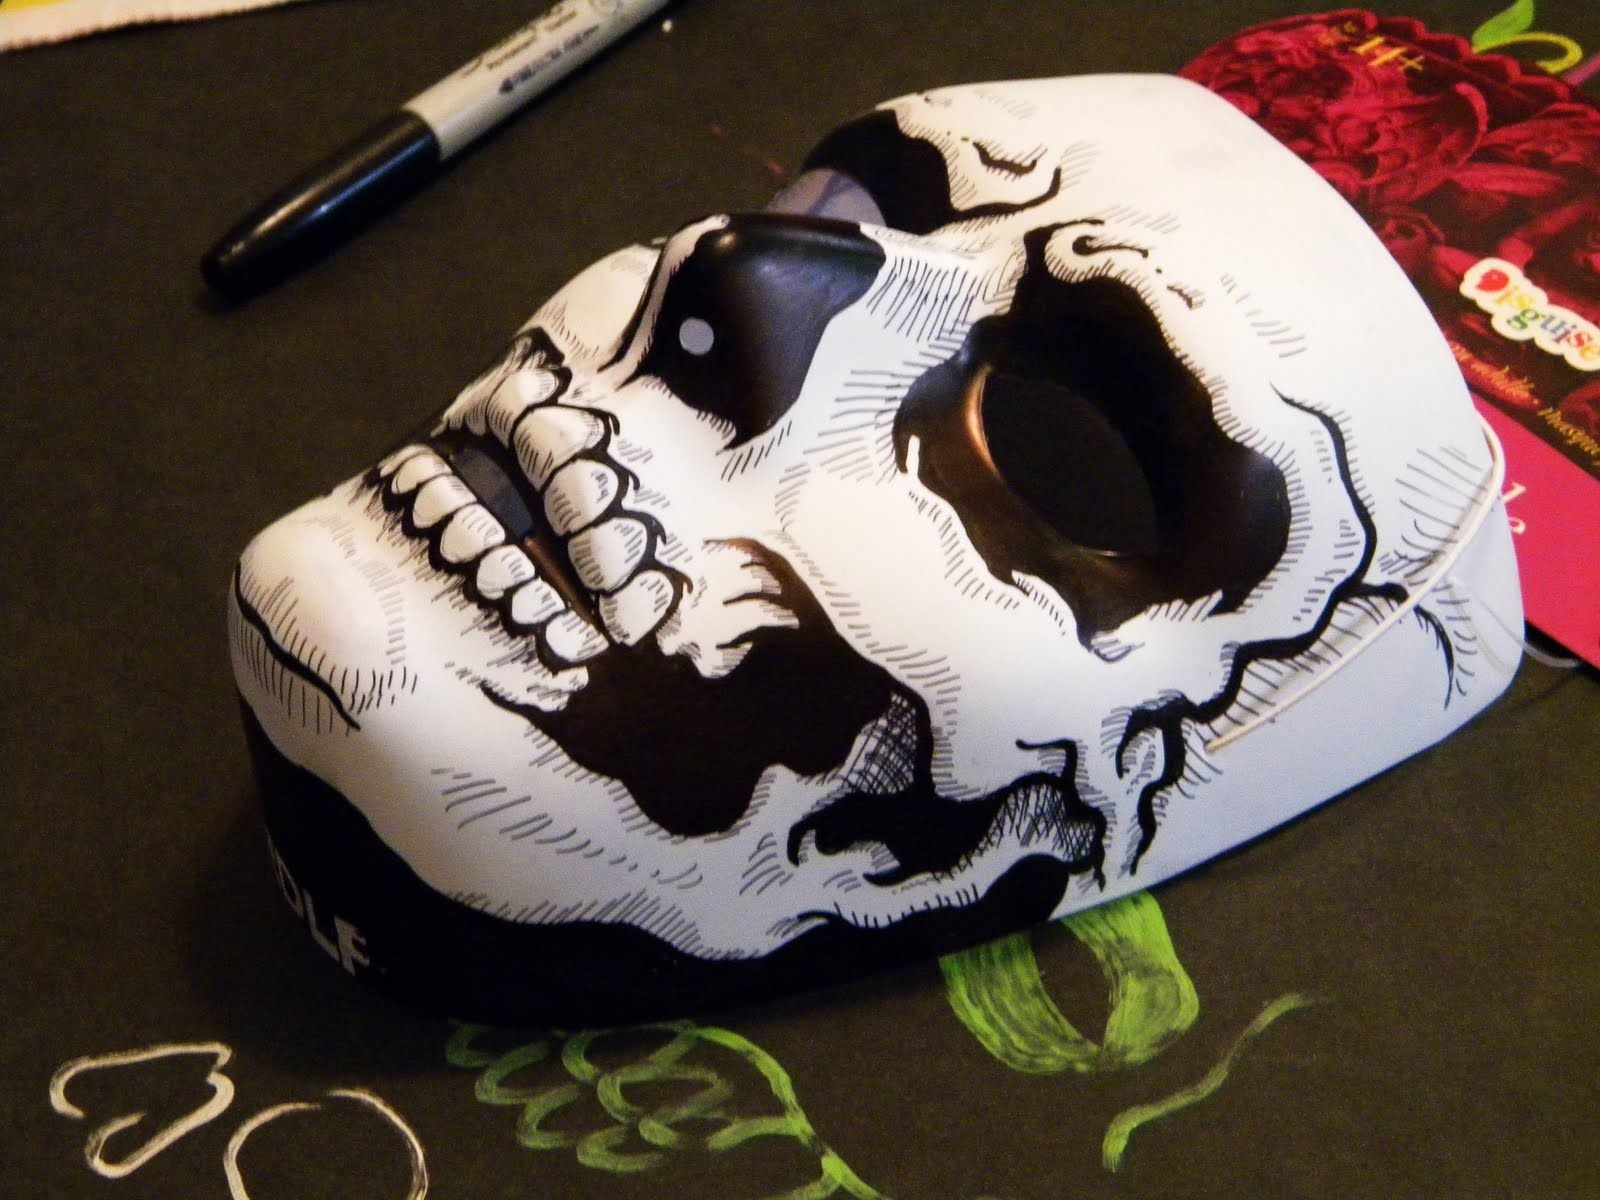 DIY Skull Mask Diy mask, Diy skulls, Skull mask